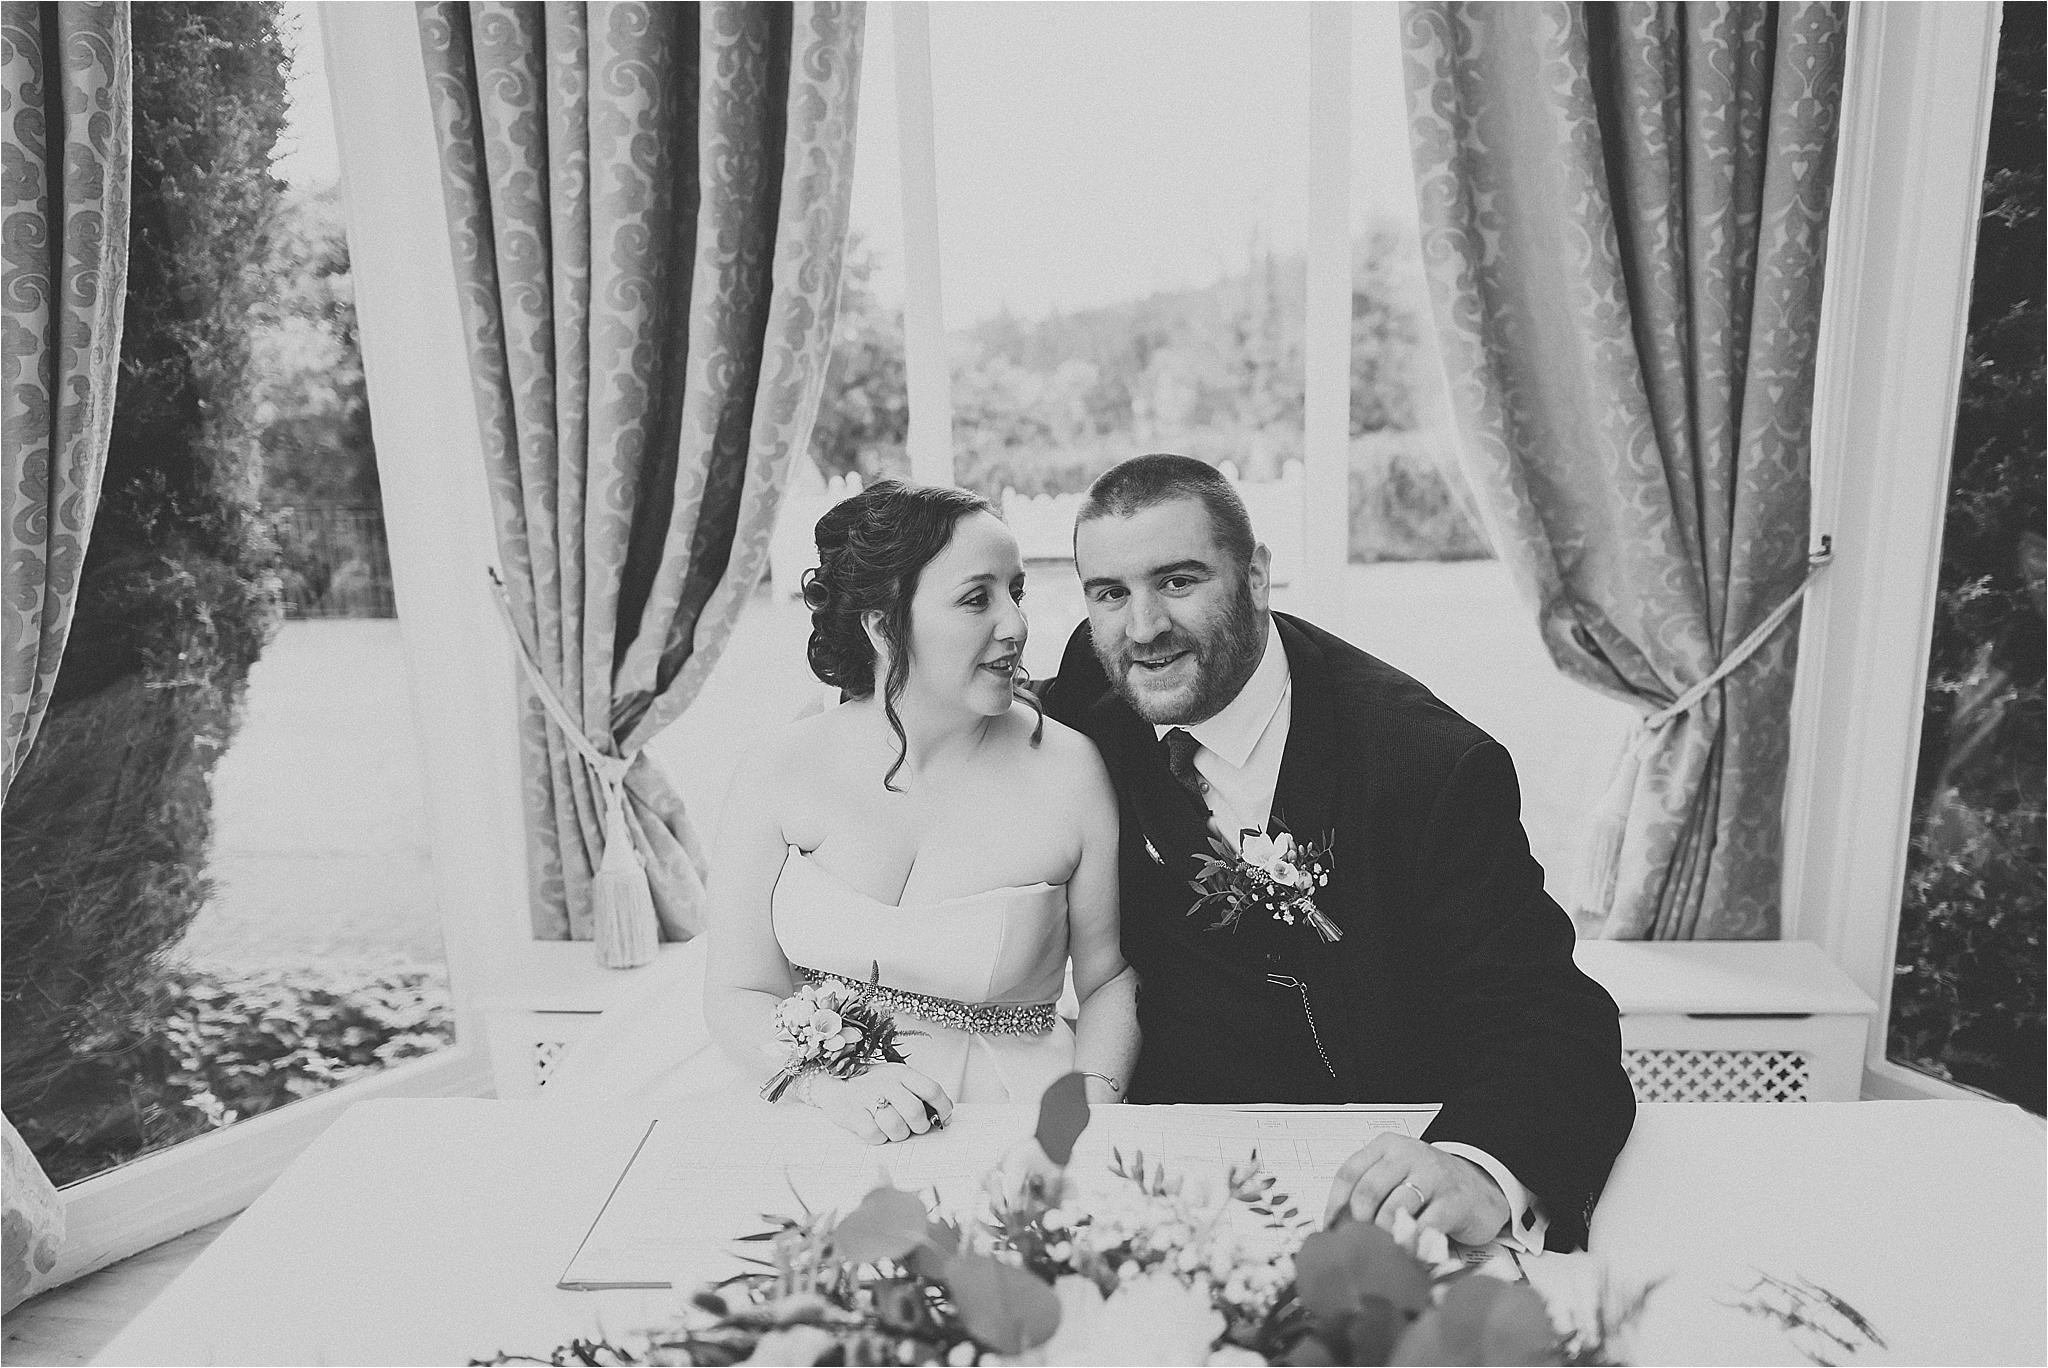 Grange Hotel Wedding Venue in the Lake District